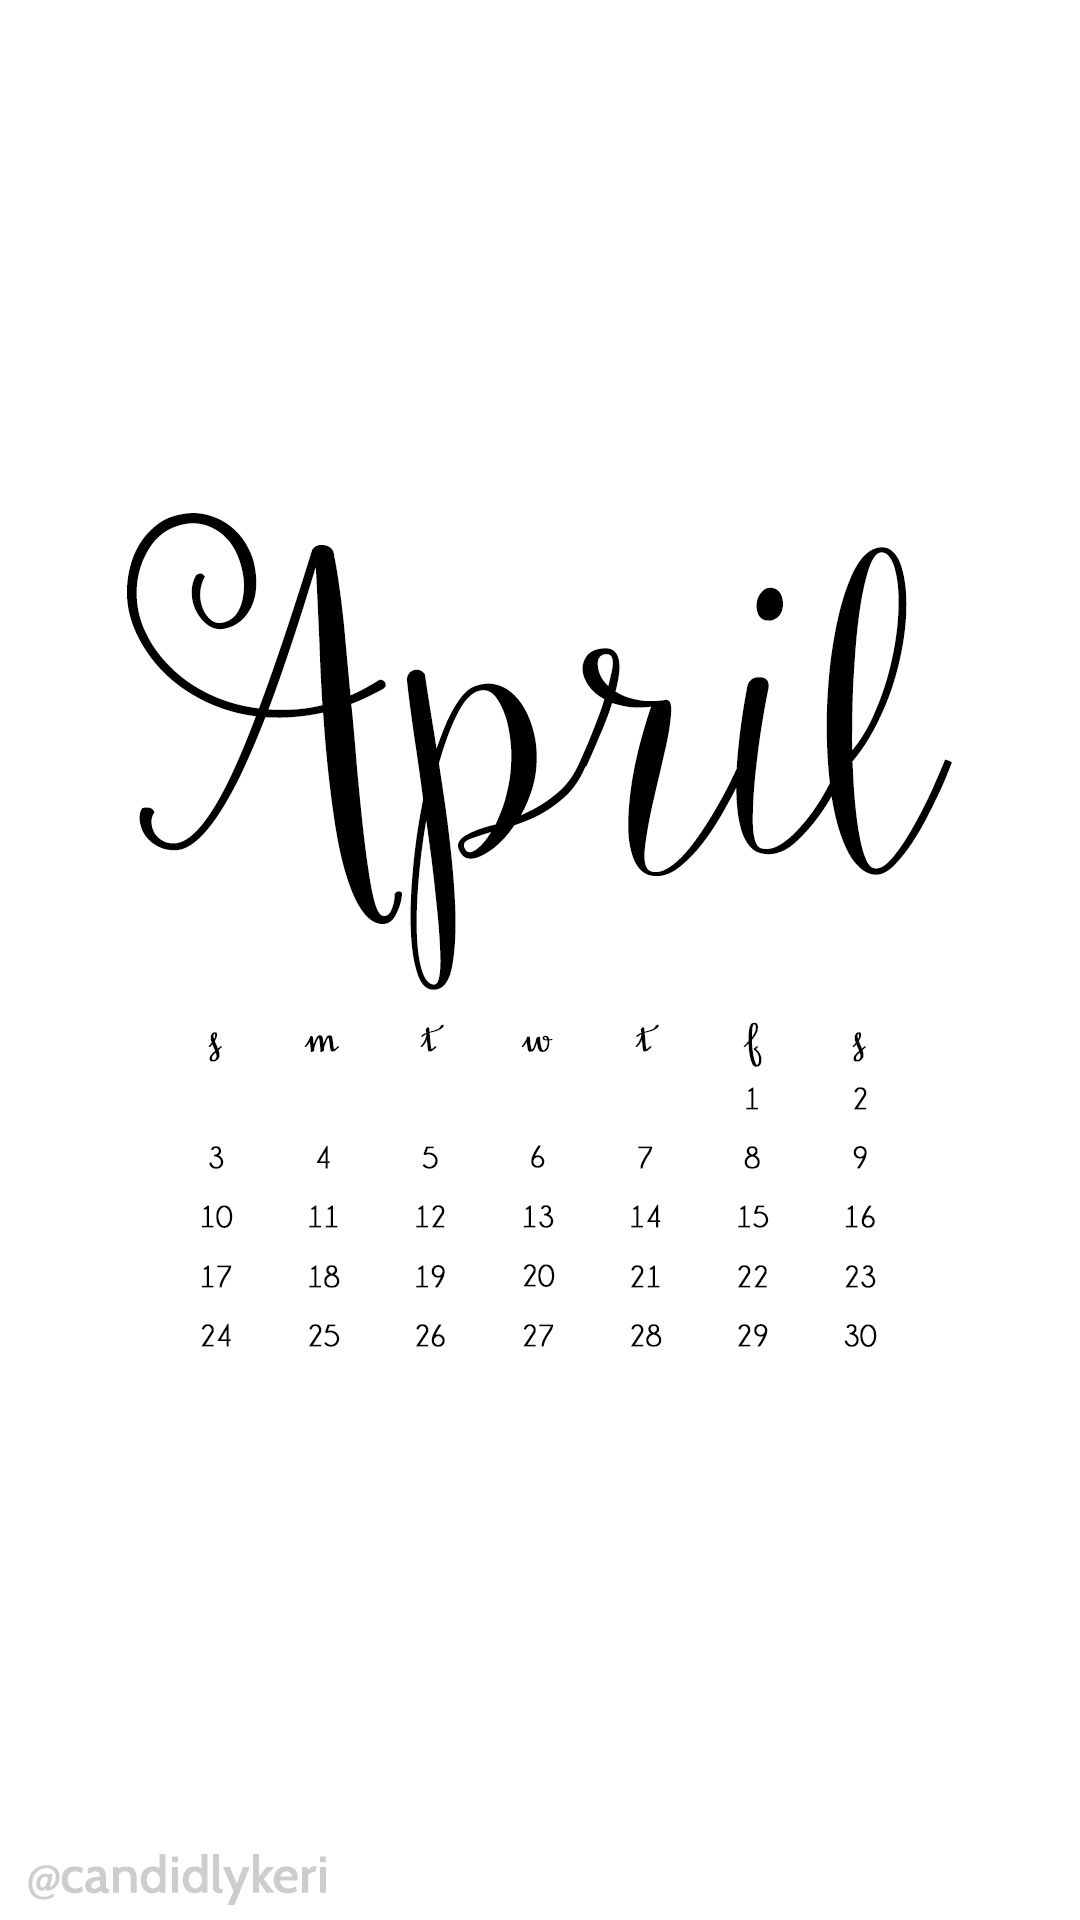 April Cursive Handwriting Script Writing For A